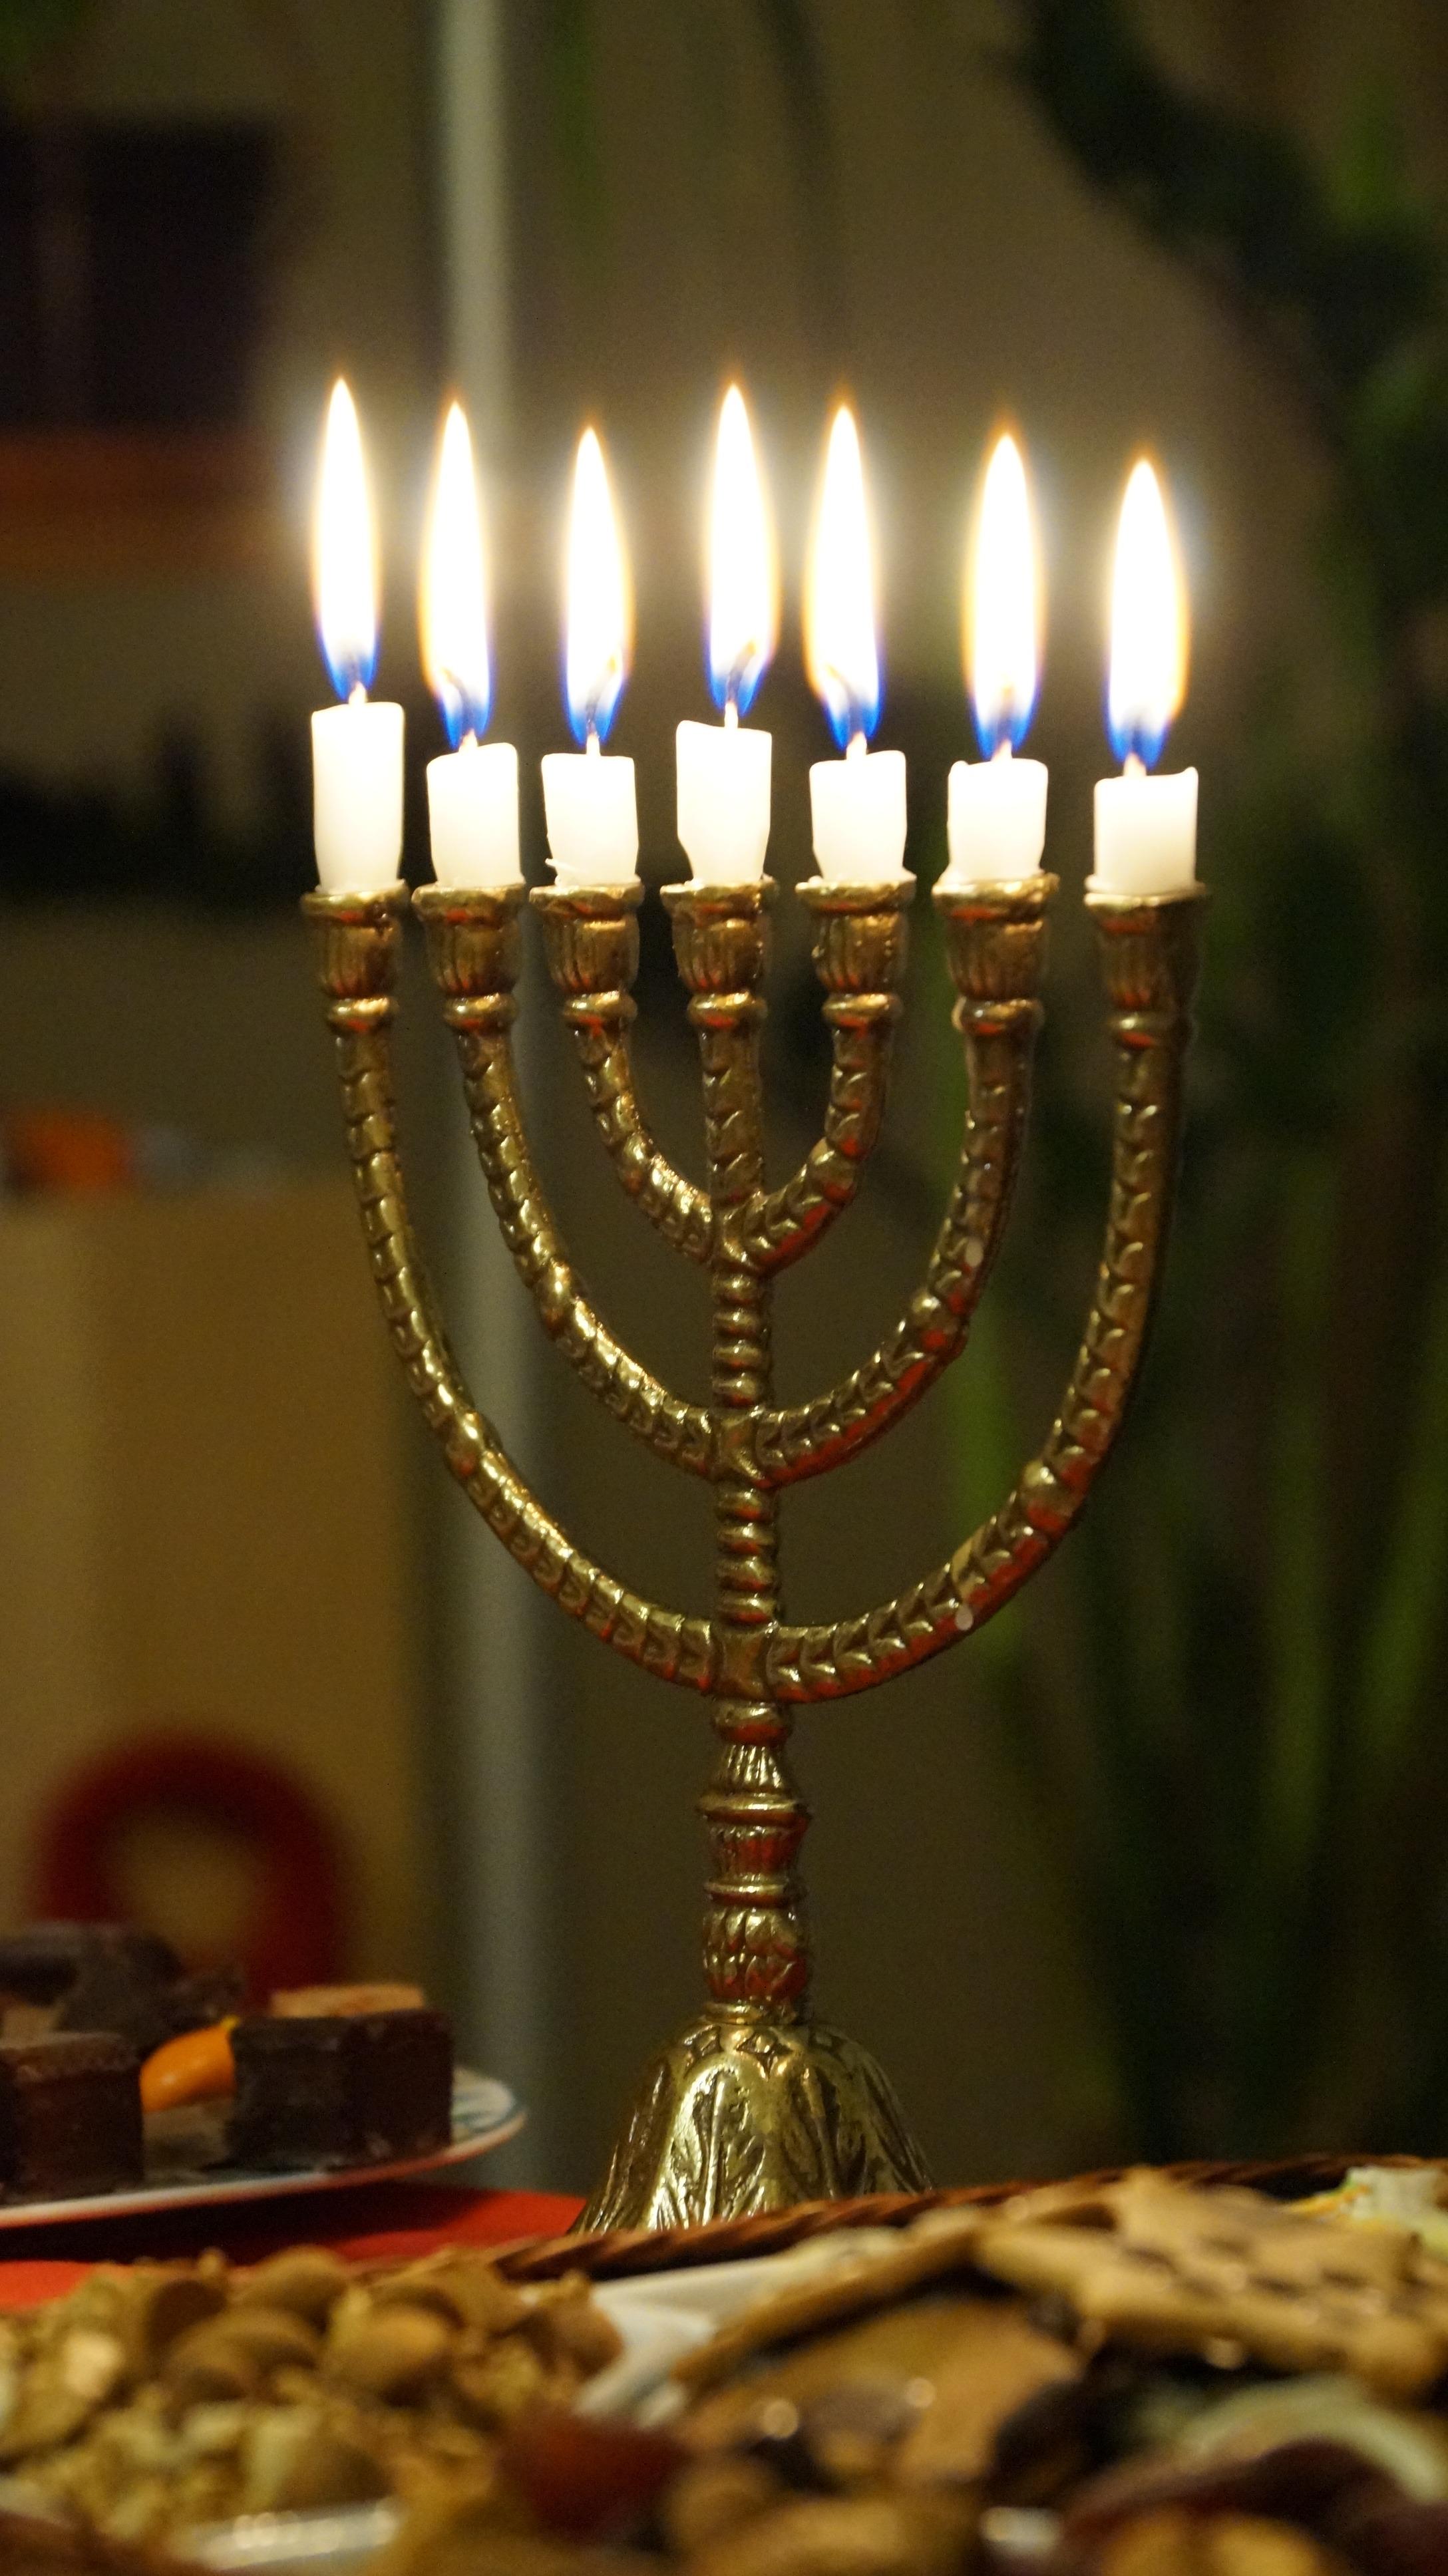 Free Images Light Antique Symbol Holiday Lighting